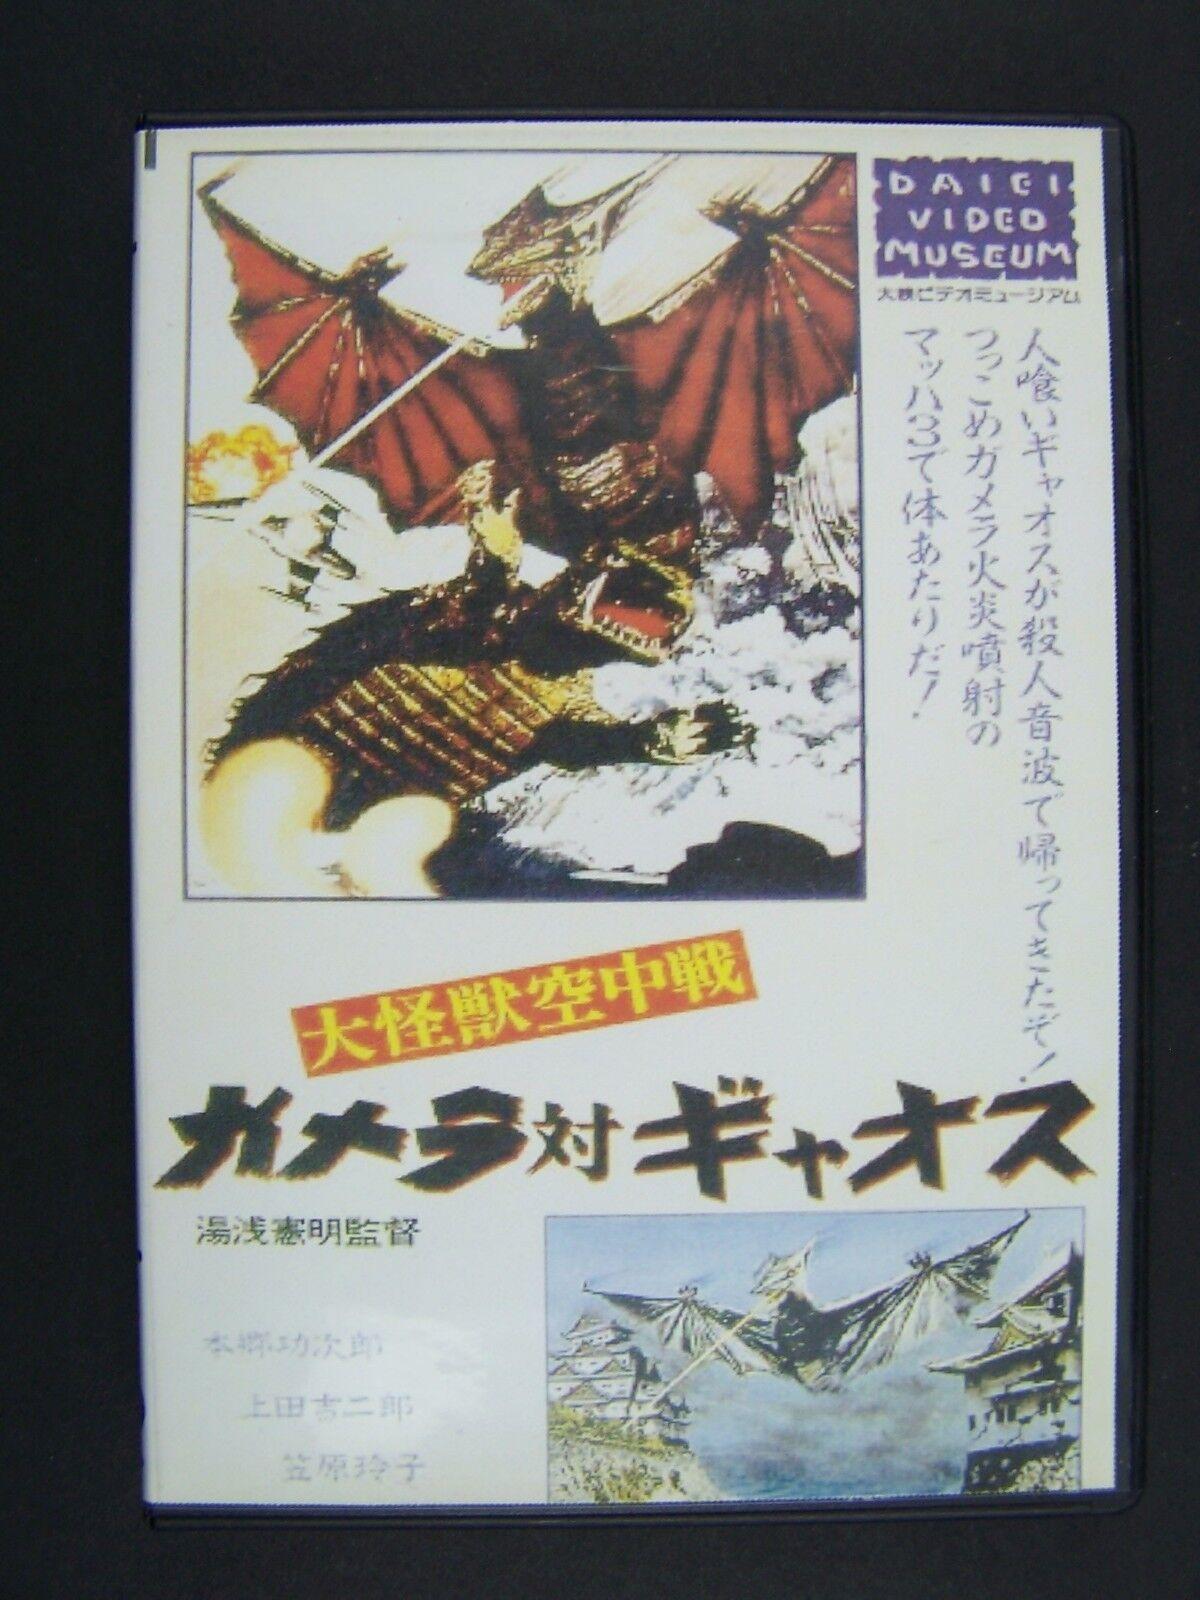 Gamera Vs Gyaos (1967) DVD